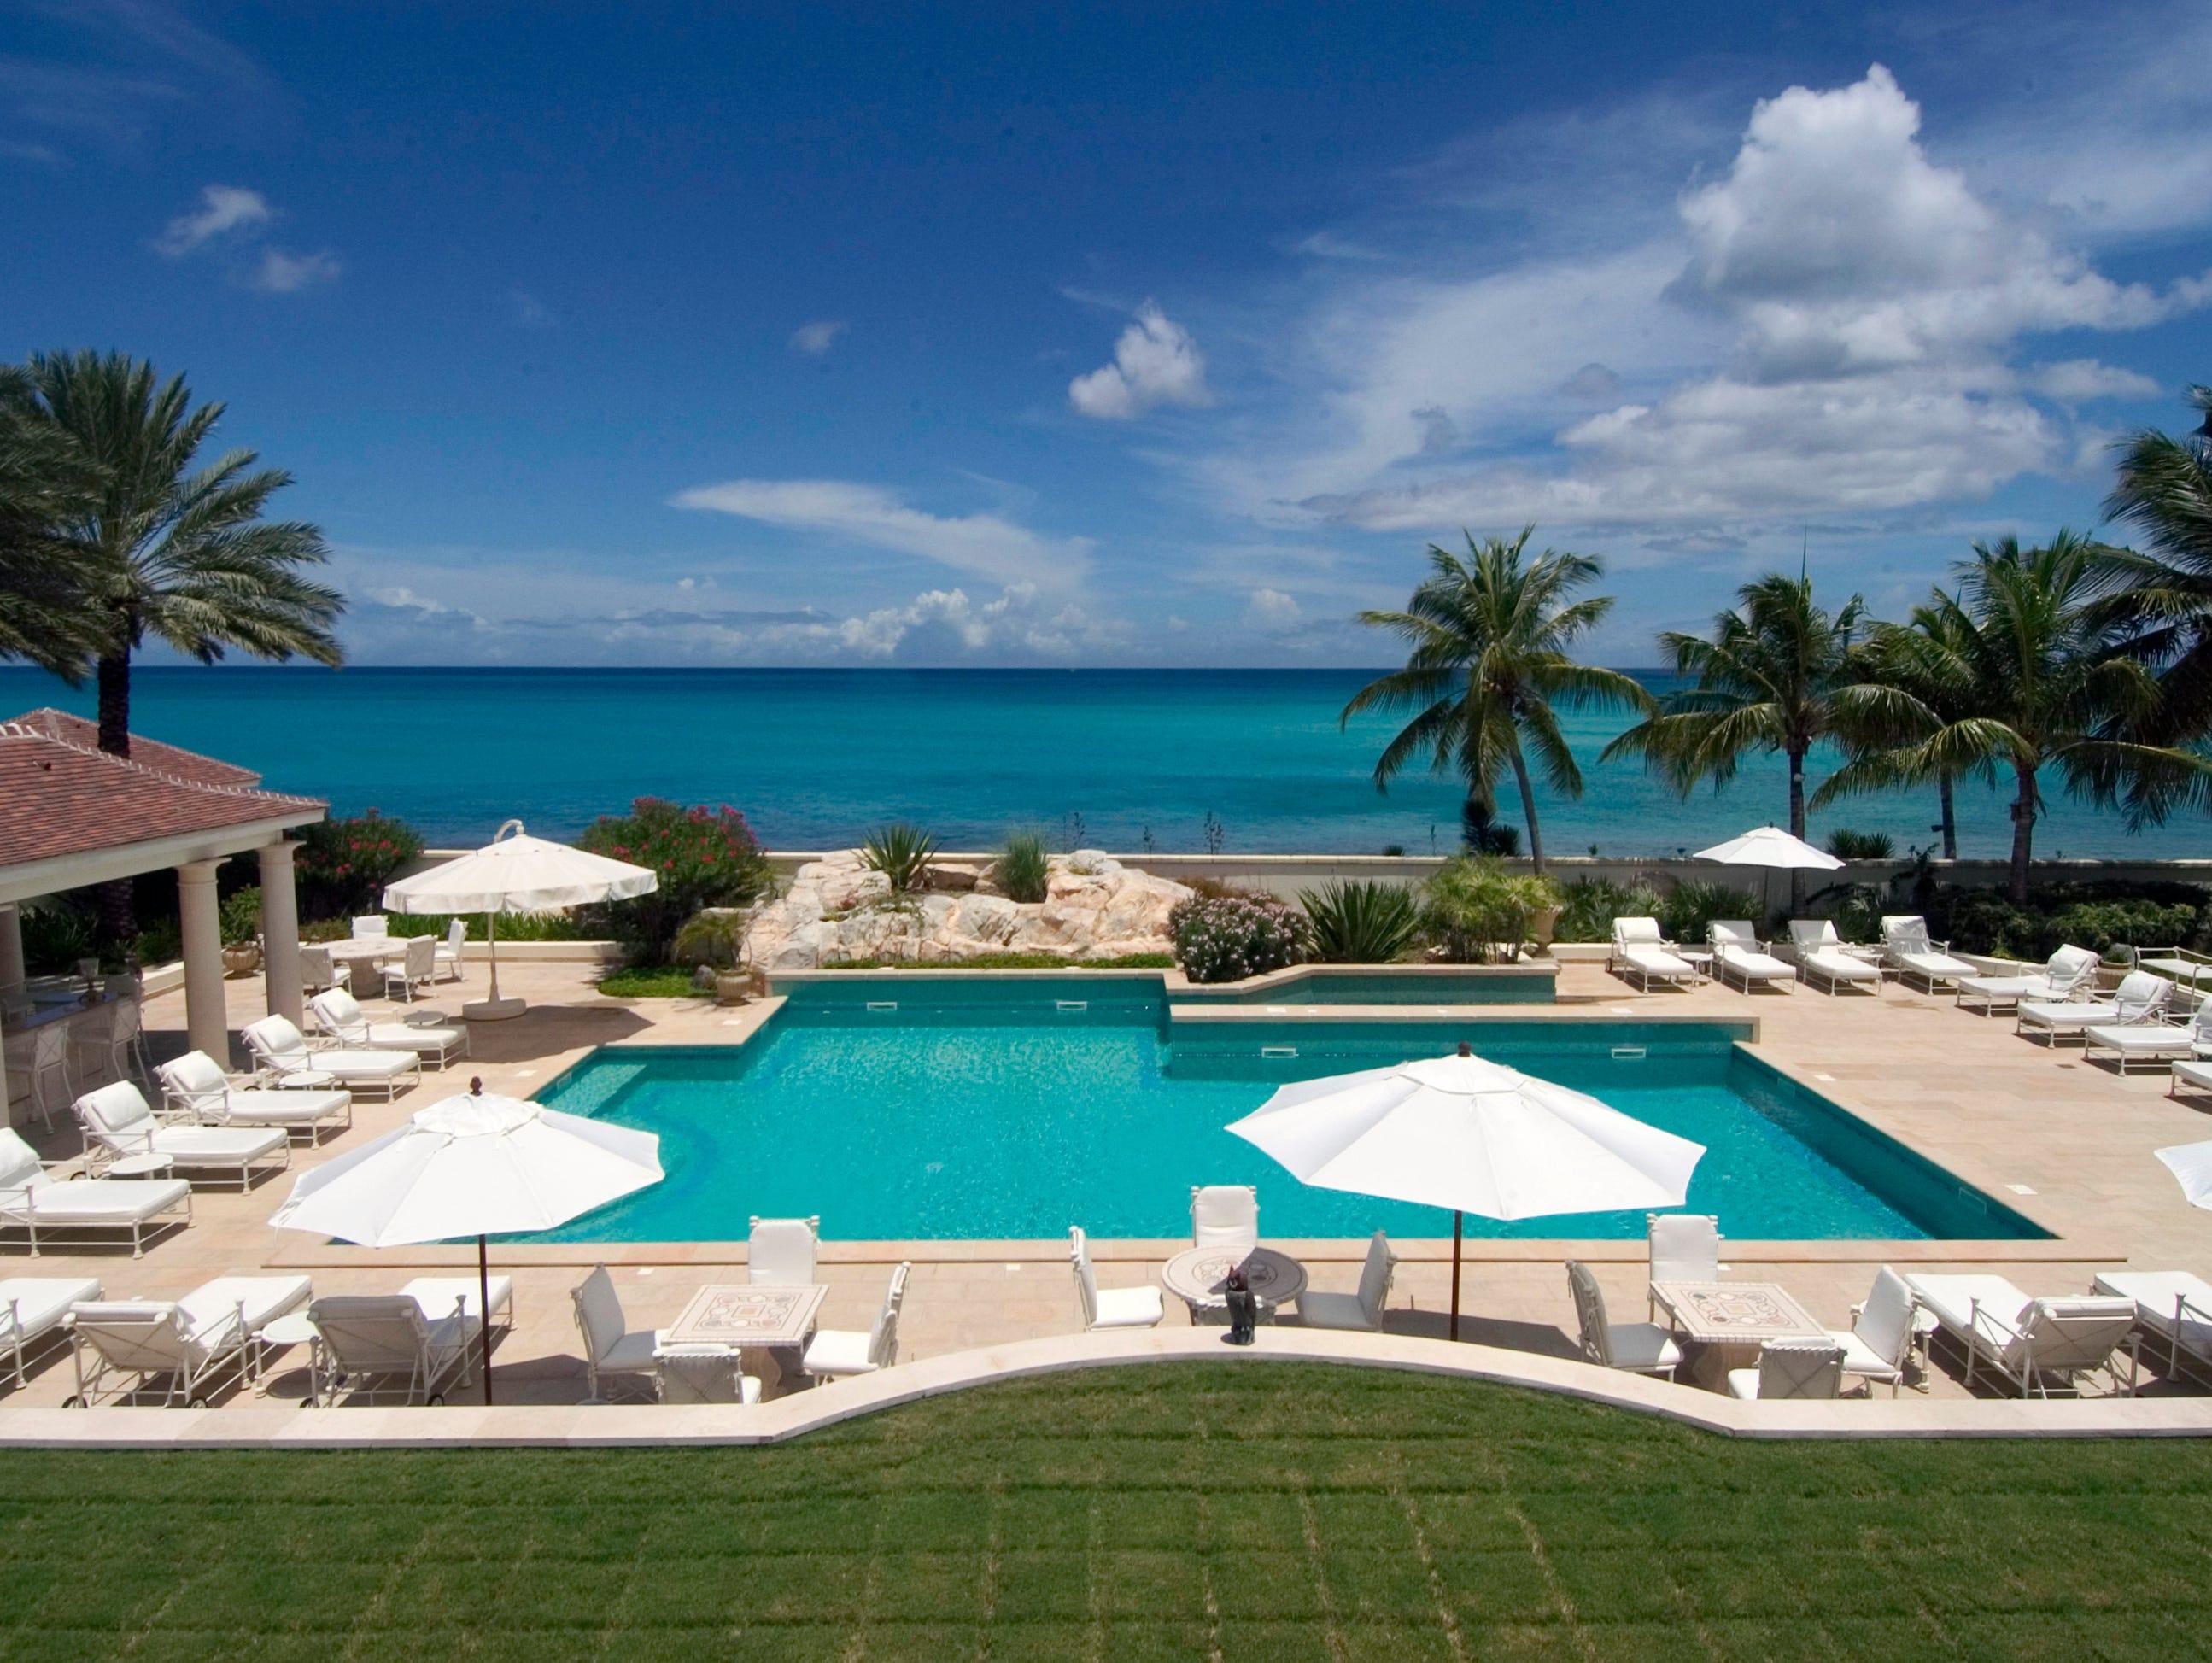 trump s caribbean villa survives irma  other celebs weren